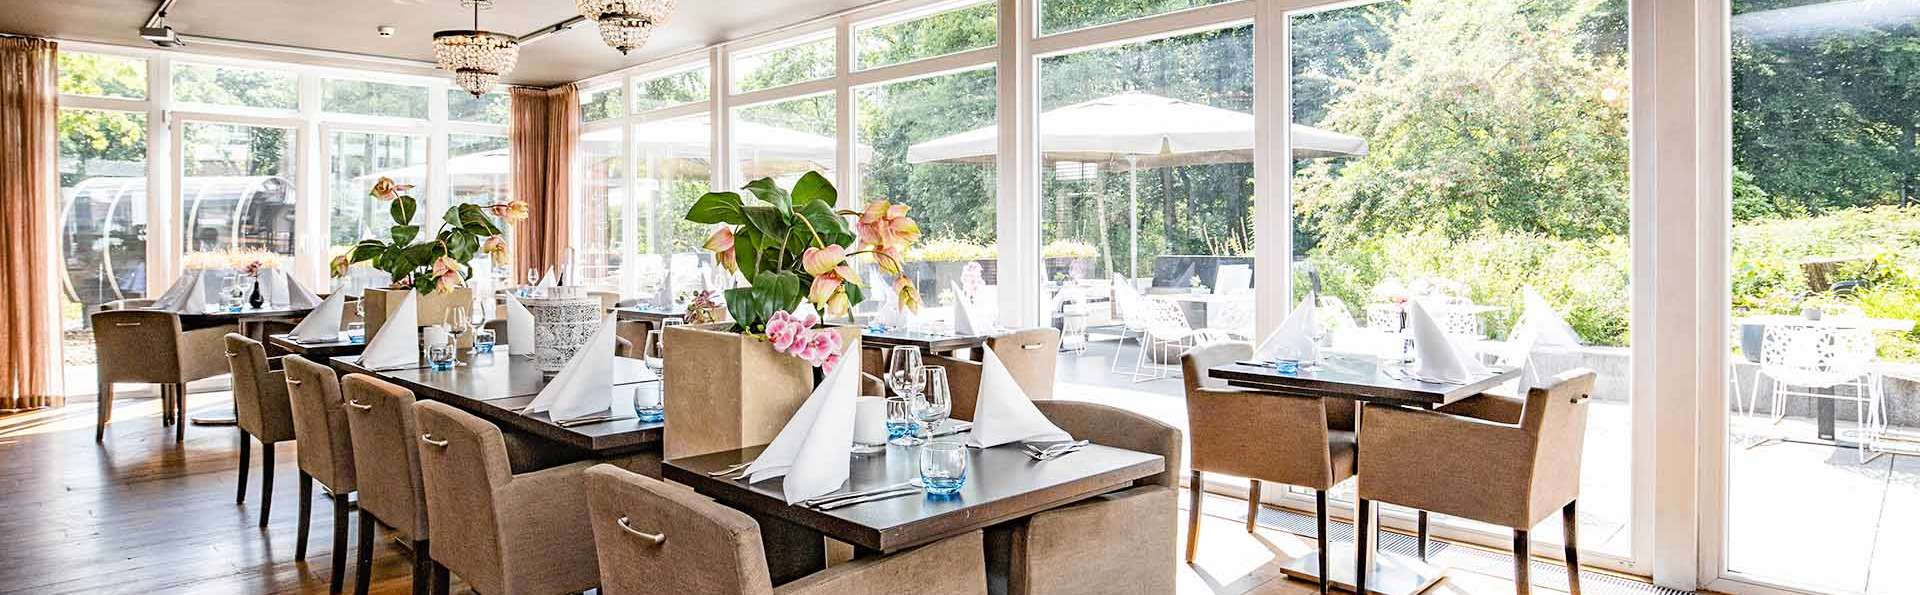 Fletcher Hotel Restaurant Amersfoort - EDIT_Amersfoort-Interieur-Restaurant_02_-_copia.jpg